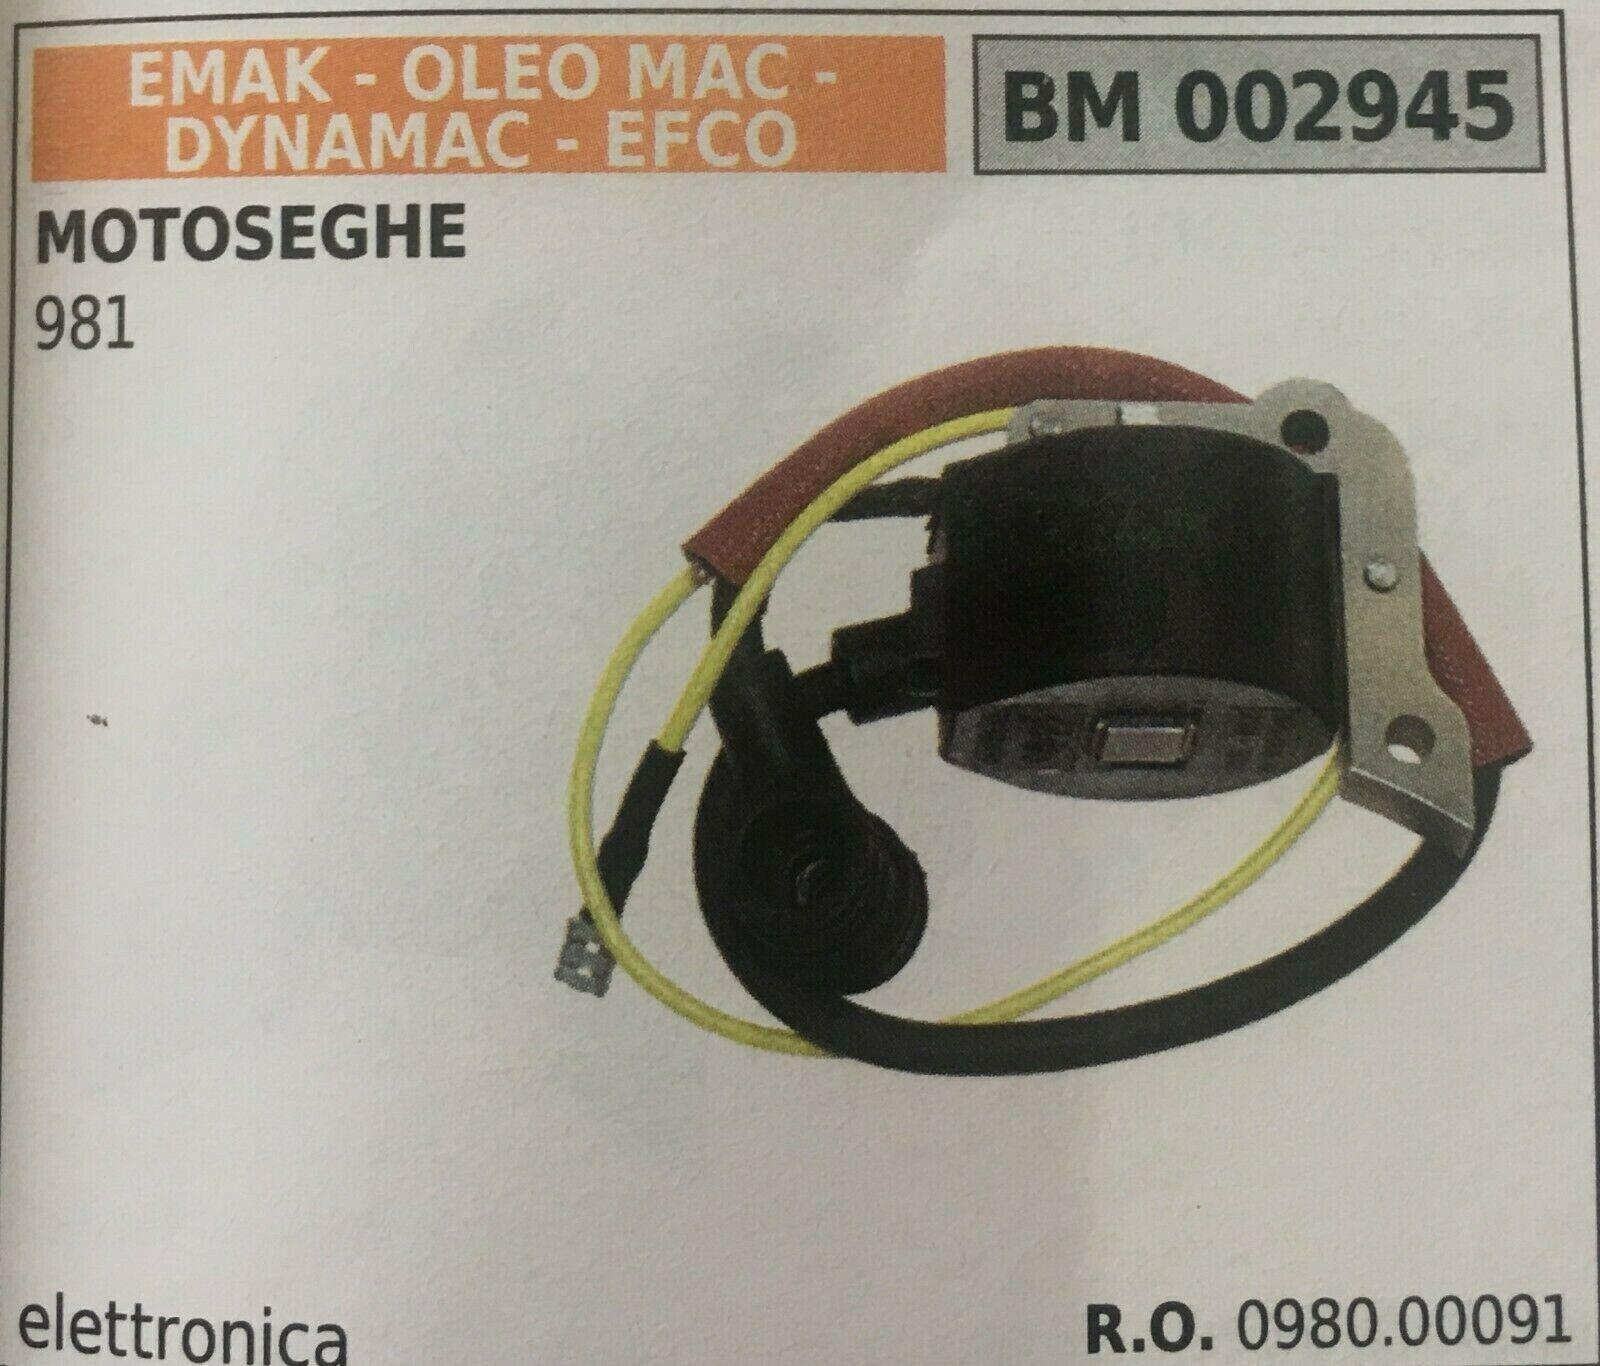 BOBINA ELETTRONICA EMAK OLEO MAC - DYNAMAC - EFCO BM 002945